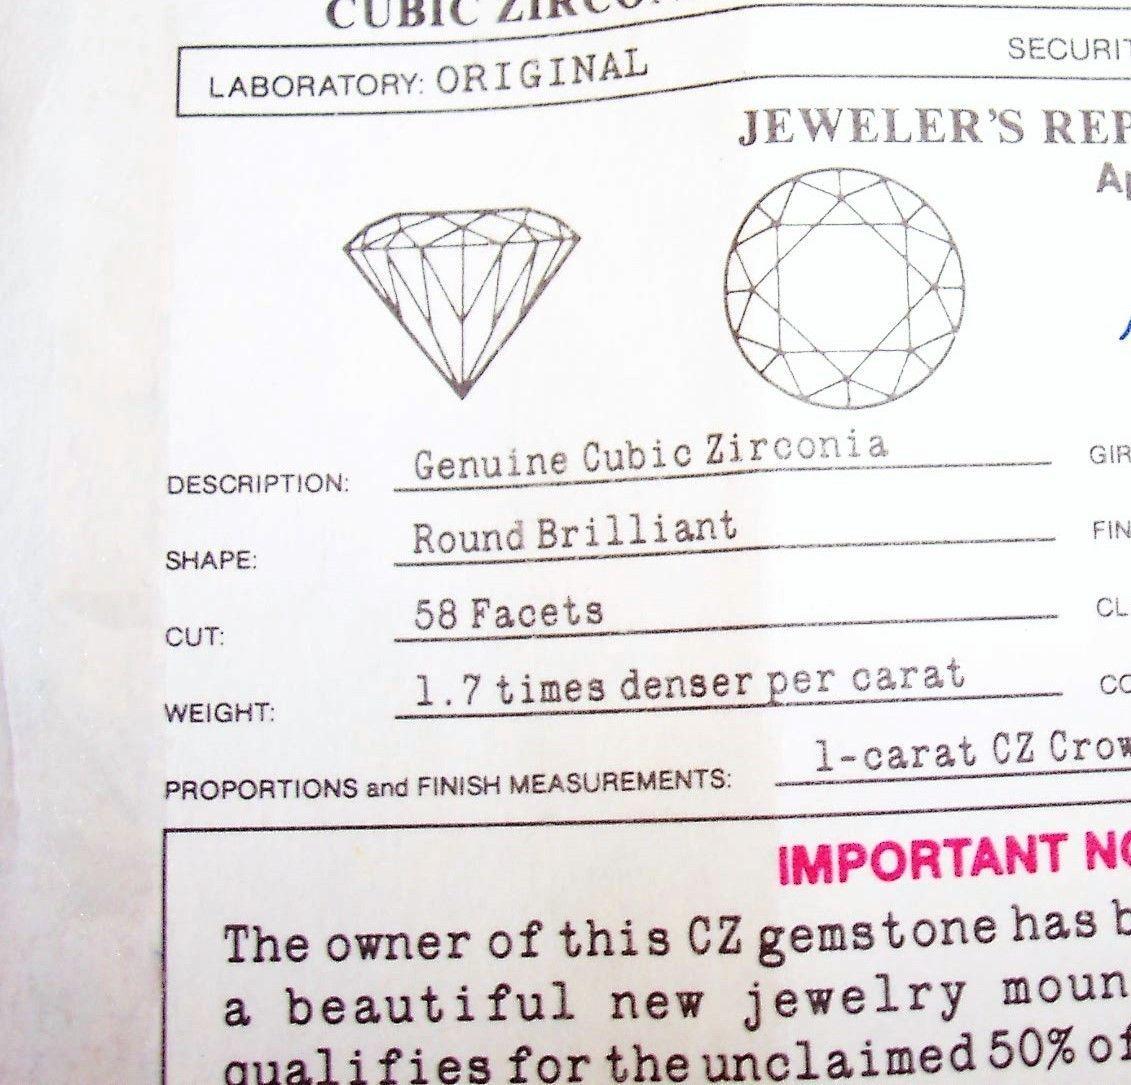 Lindenwold Fine Jewelers 1 Carat loose Cubic Zirconia W/ Certificate & pkg